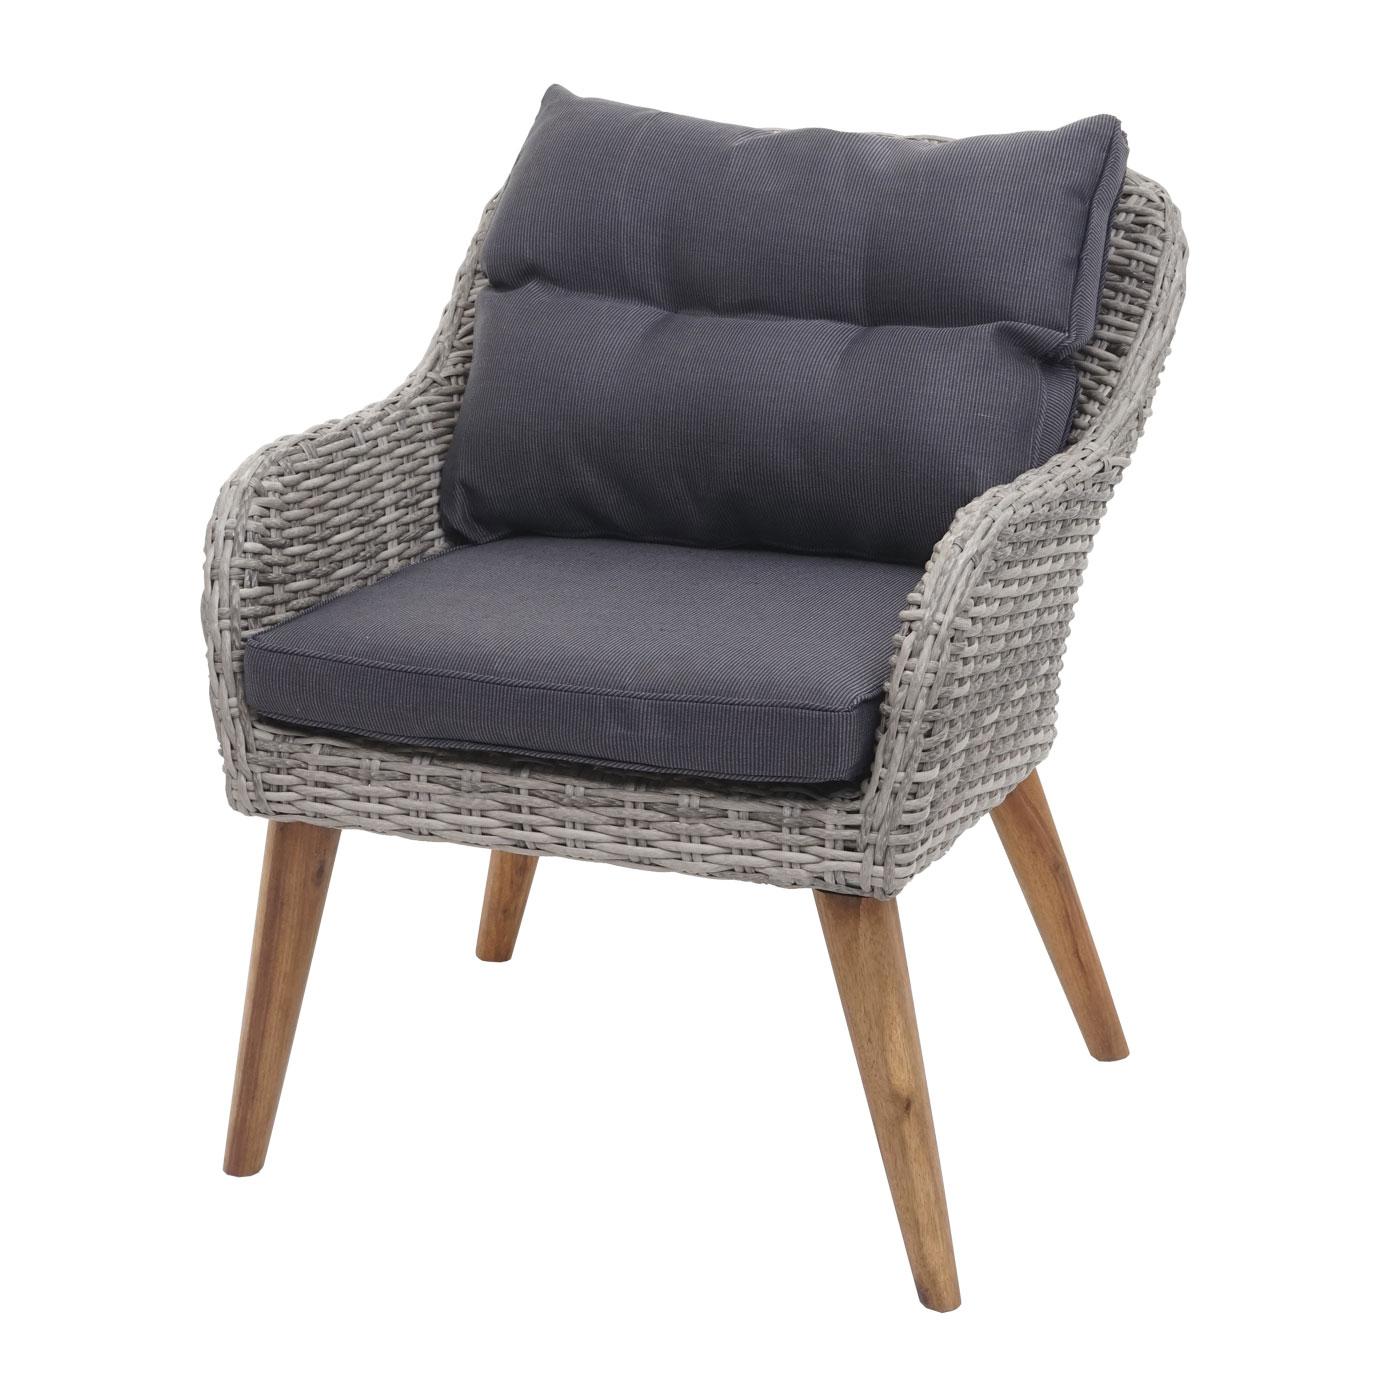 Gartengarnitur HWC-H64 Frontansicht Sessel